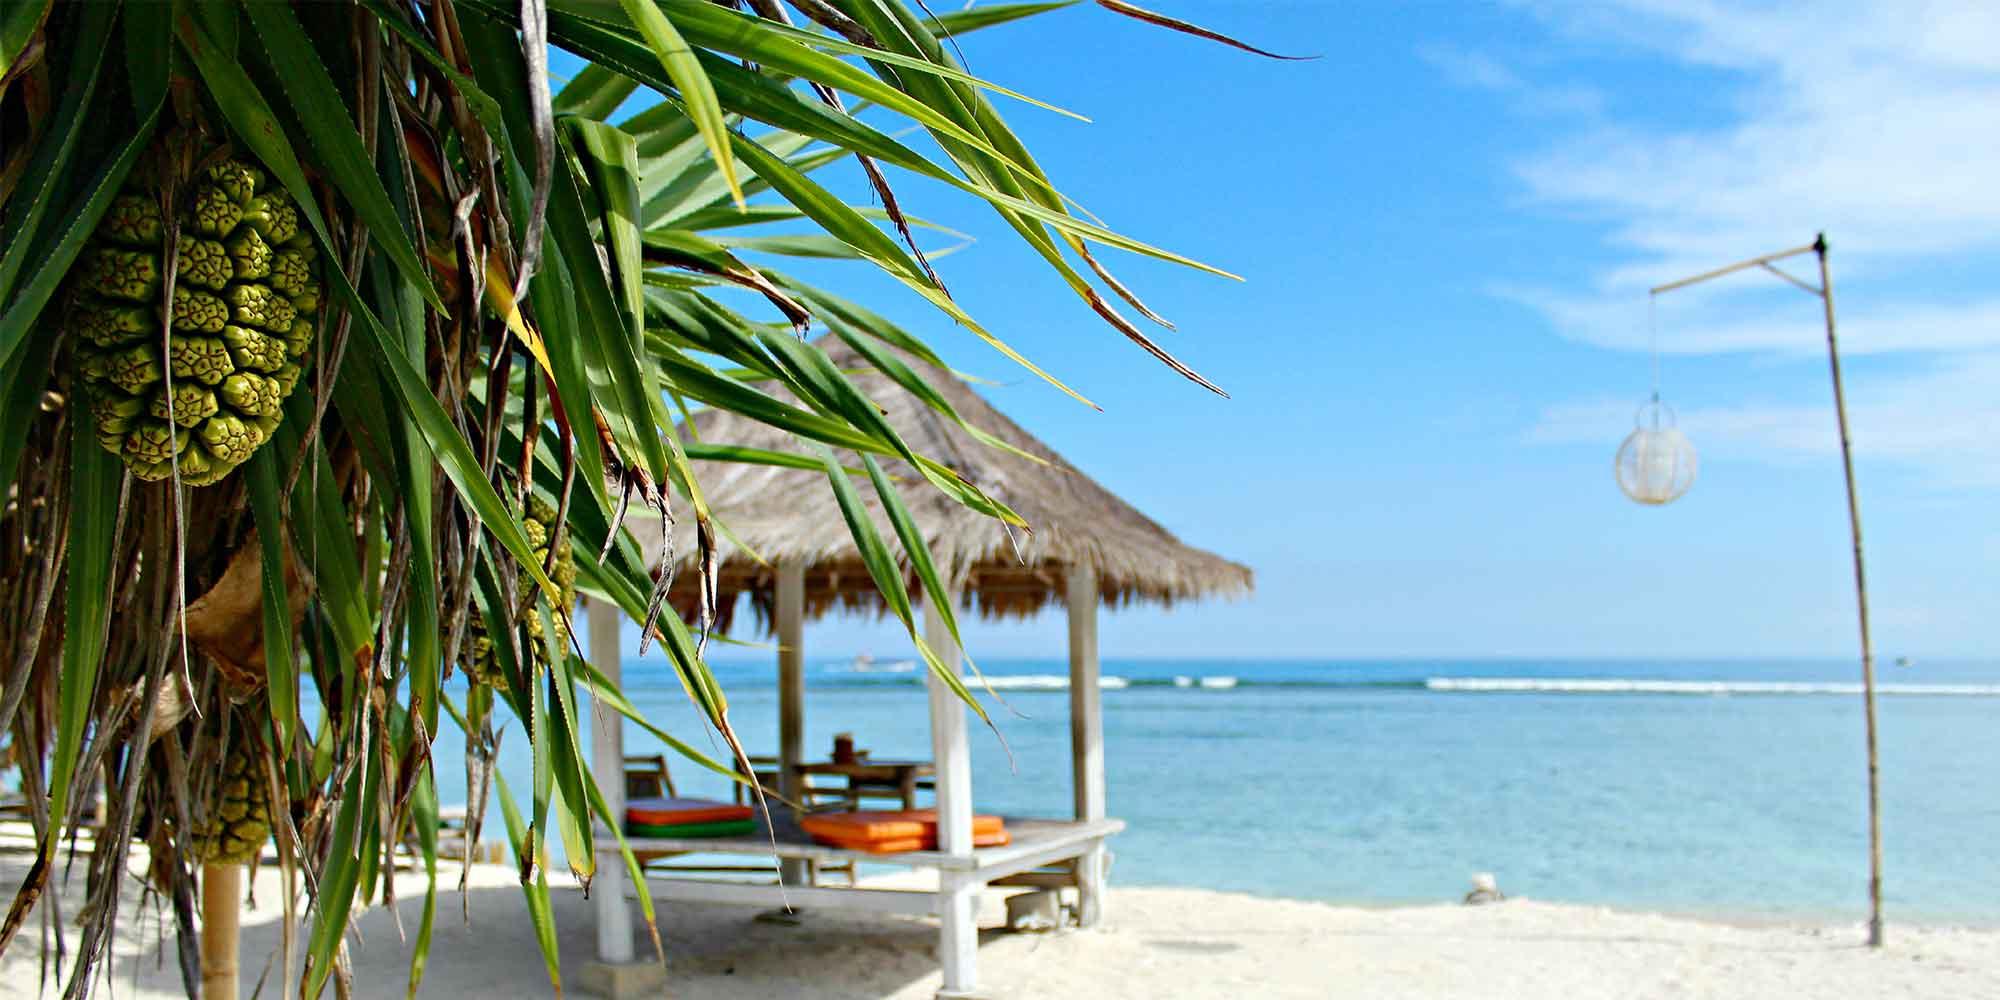 paysage paradisiaque bali iles gili indonésie